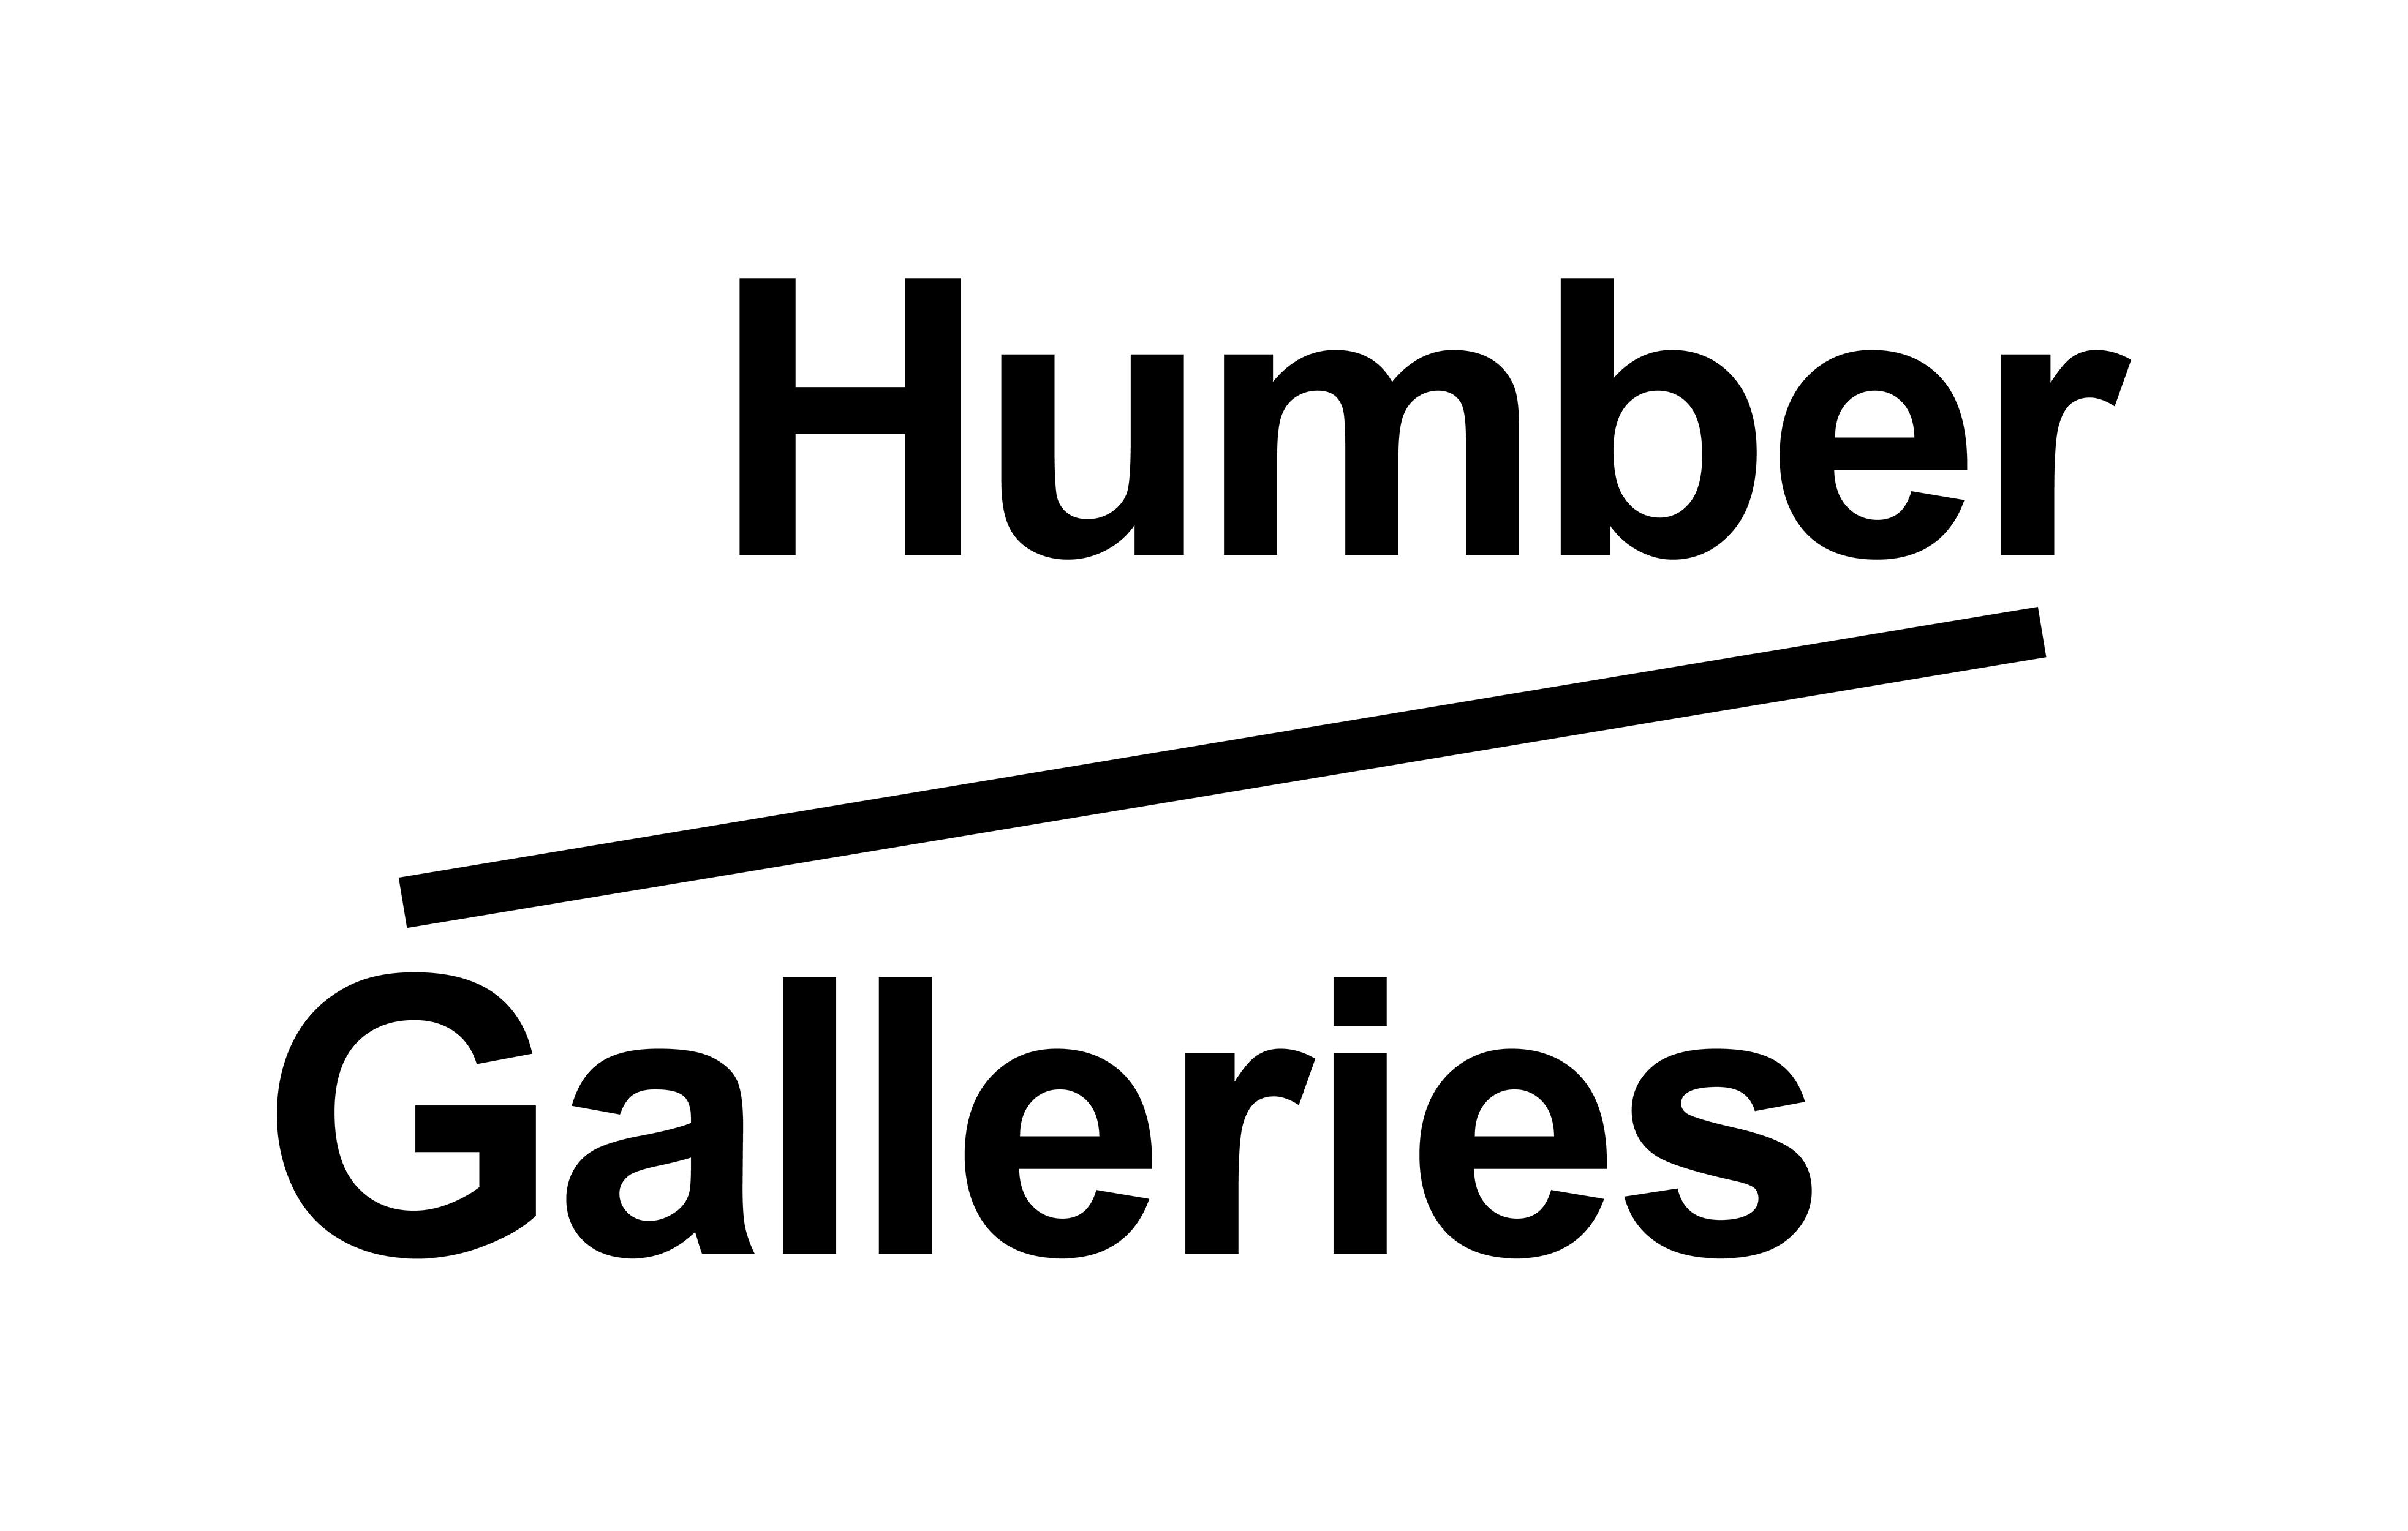 Humber Galleries